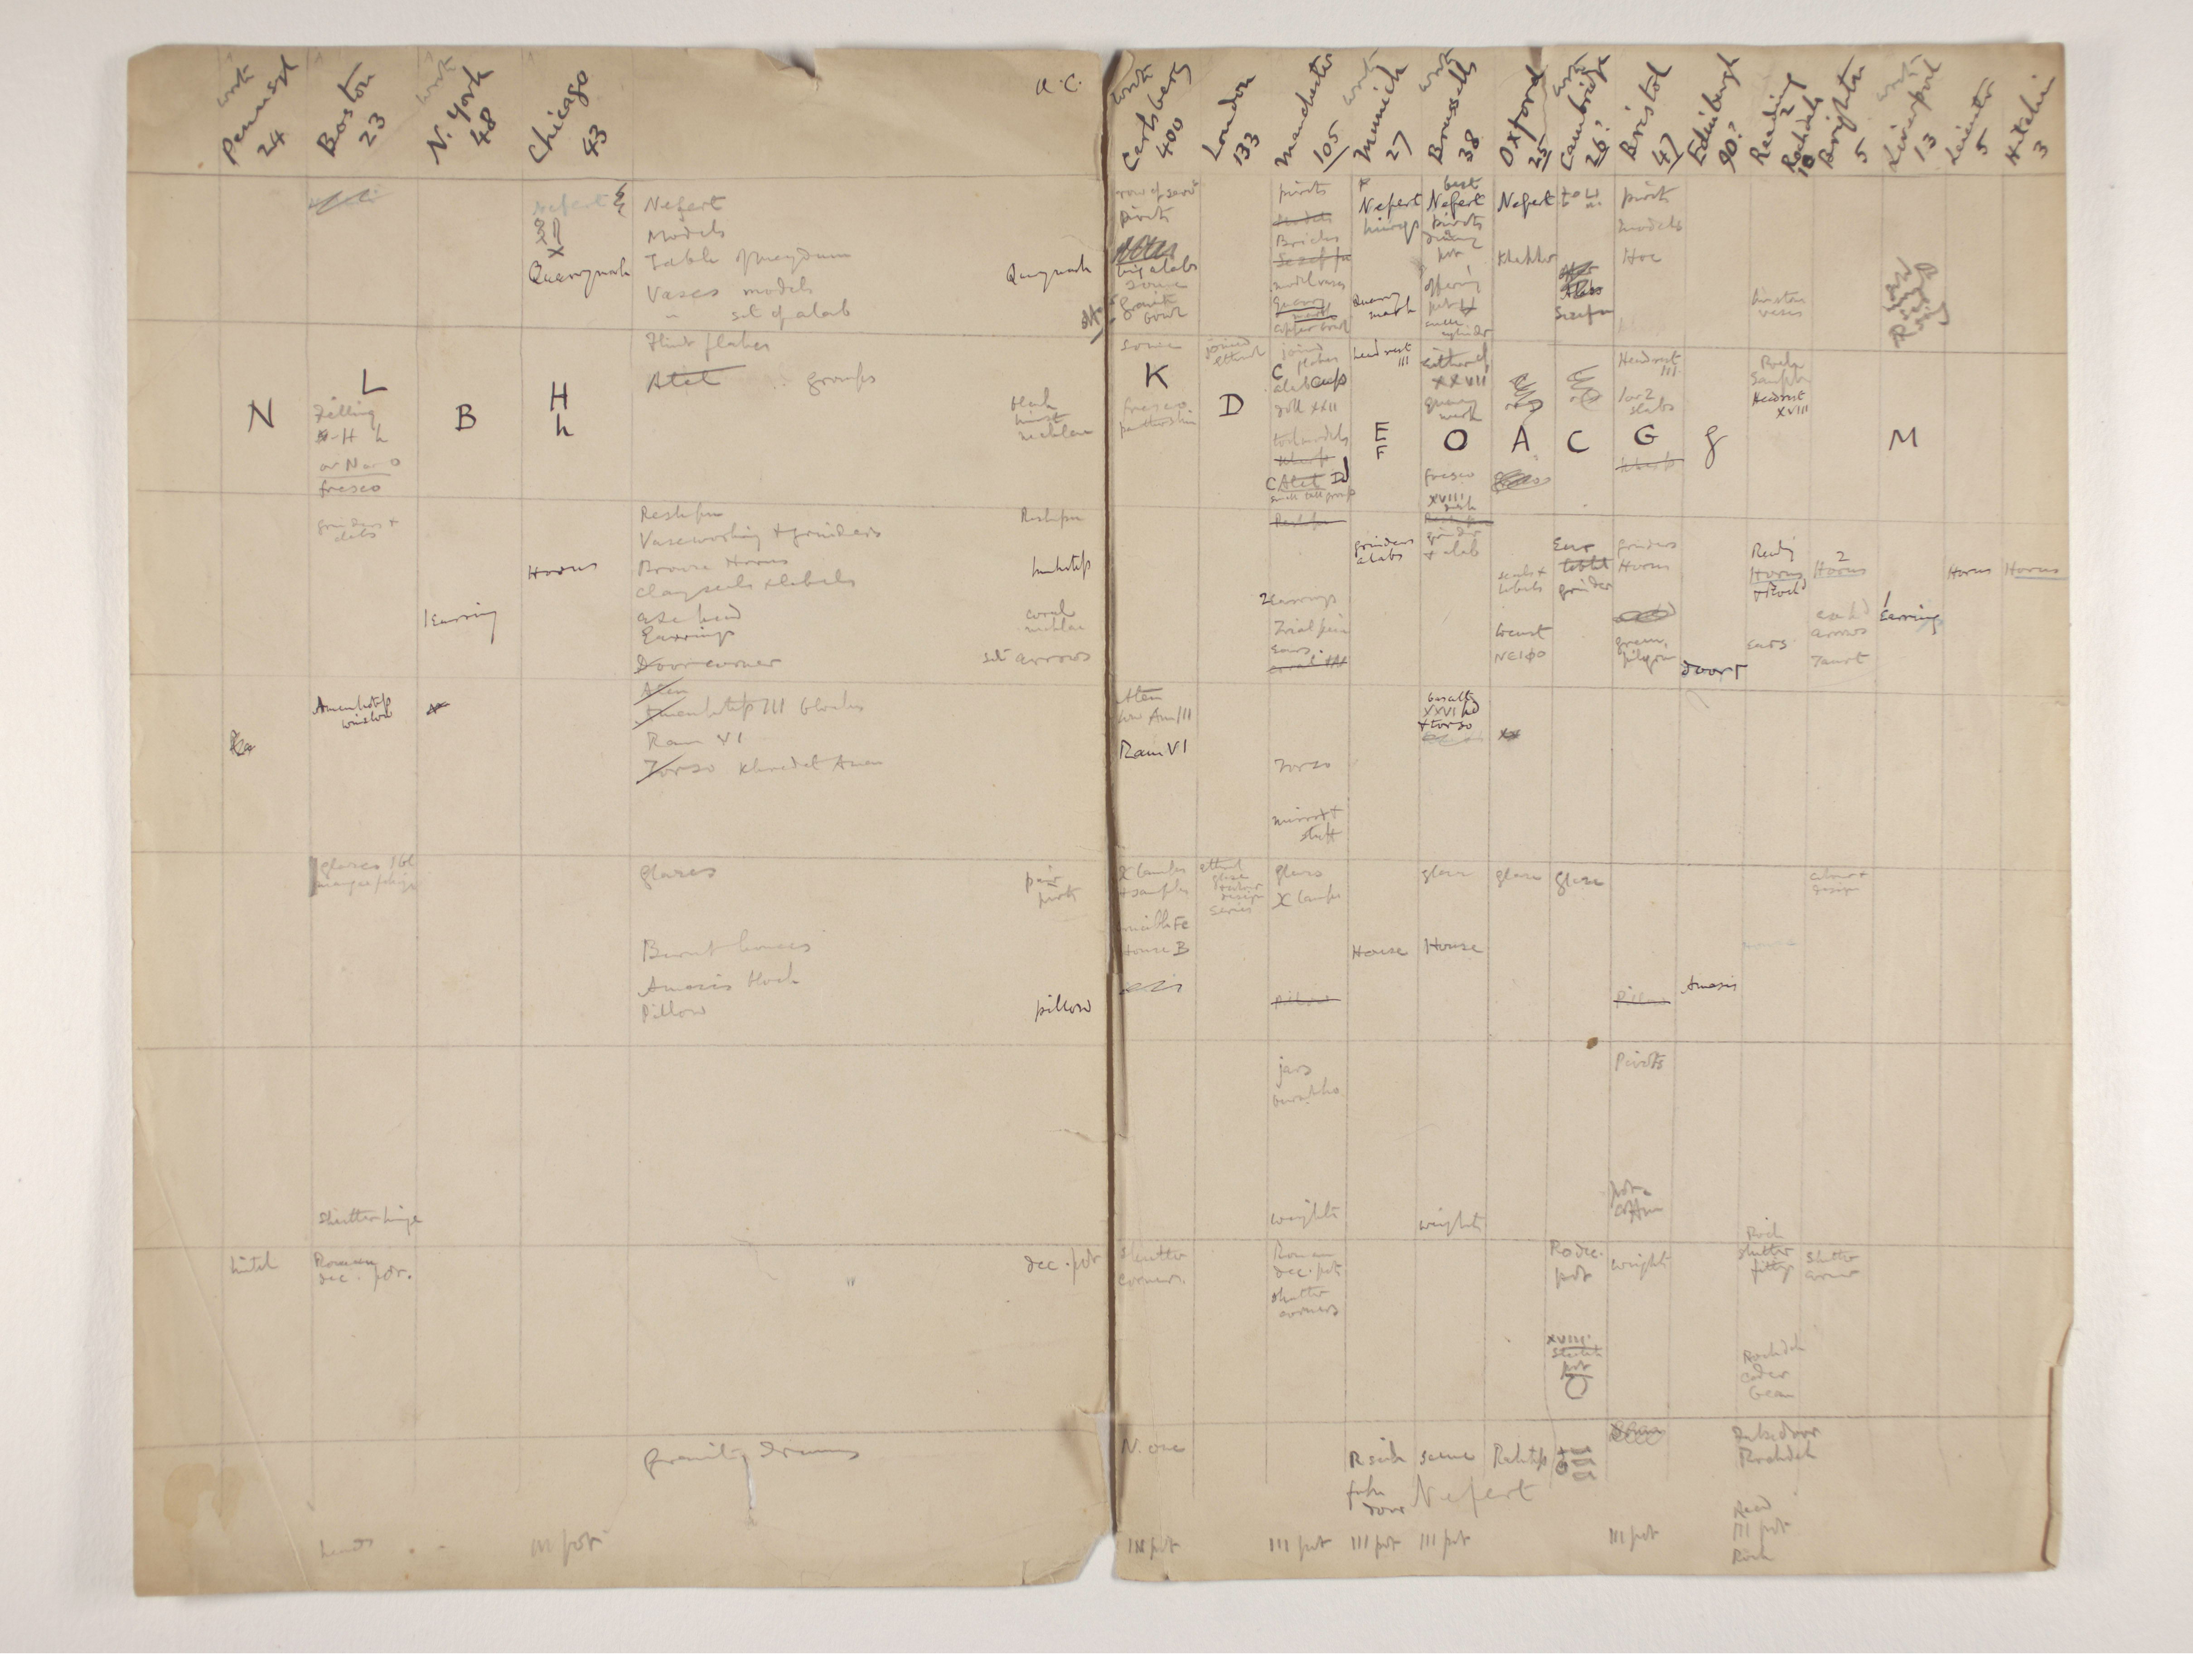 1909-10 Meidum, Memphis Multiple institution list PMA/WFP1/D/18/5.1